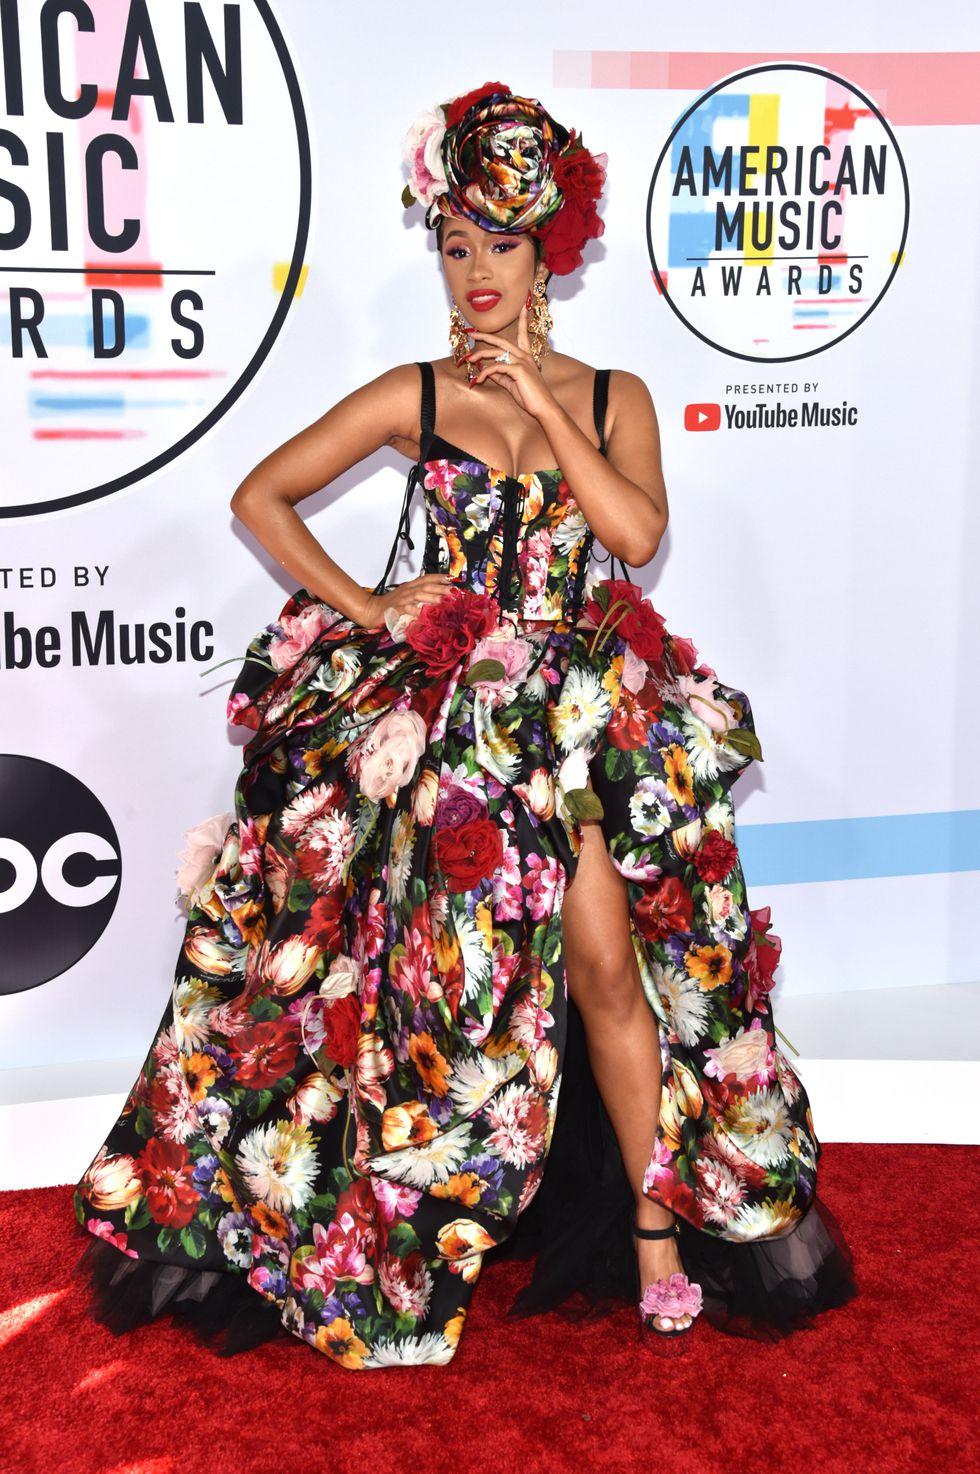 cardi-b-attends-the-2018-american-music-awards-at-microsoft-news-photo-1048392836-1539128801.jpg